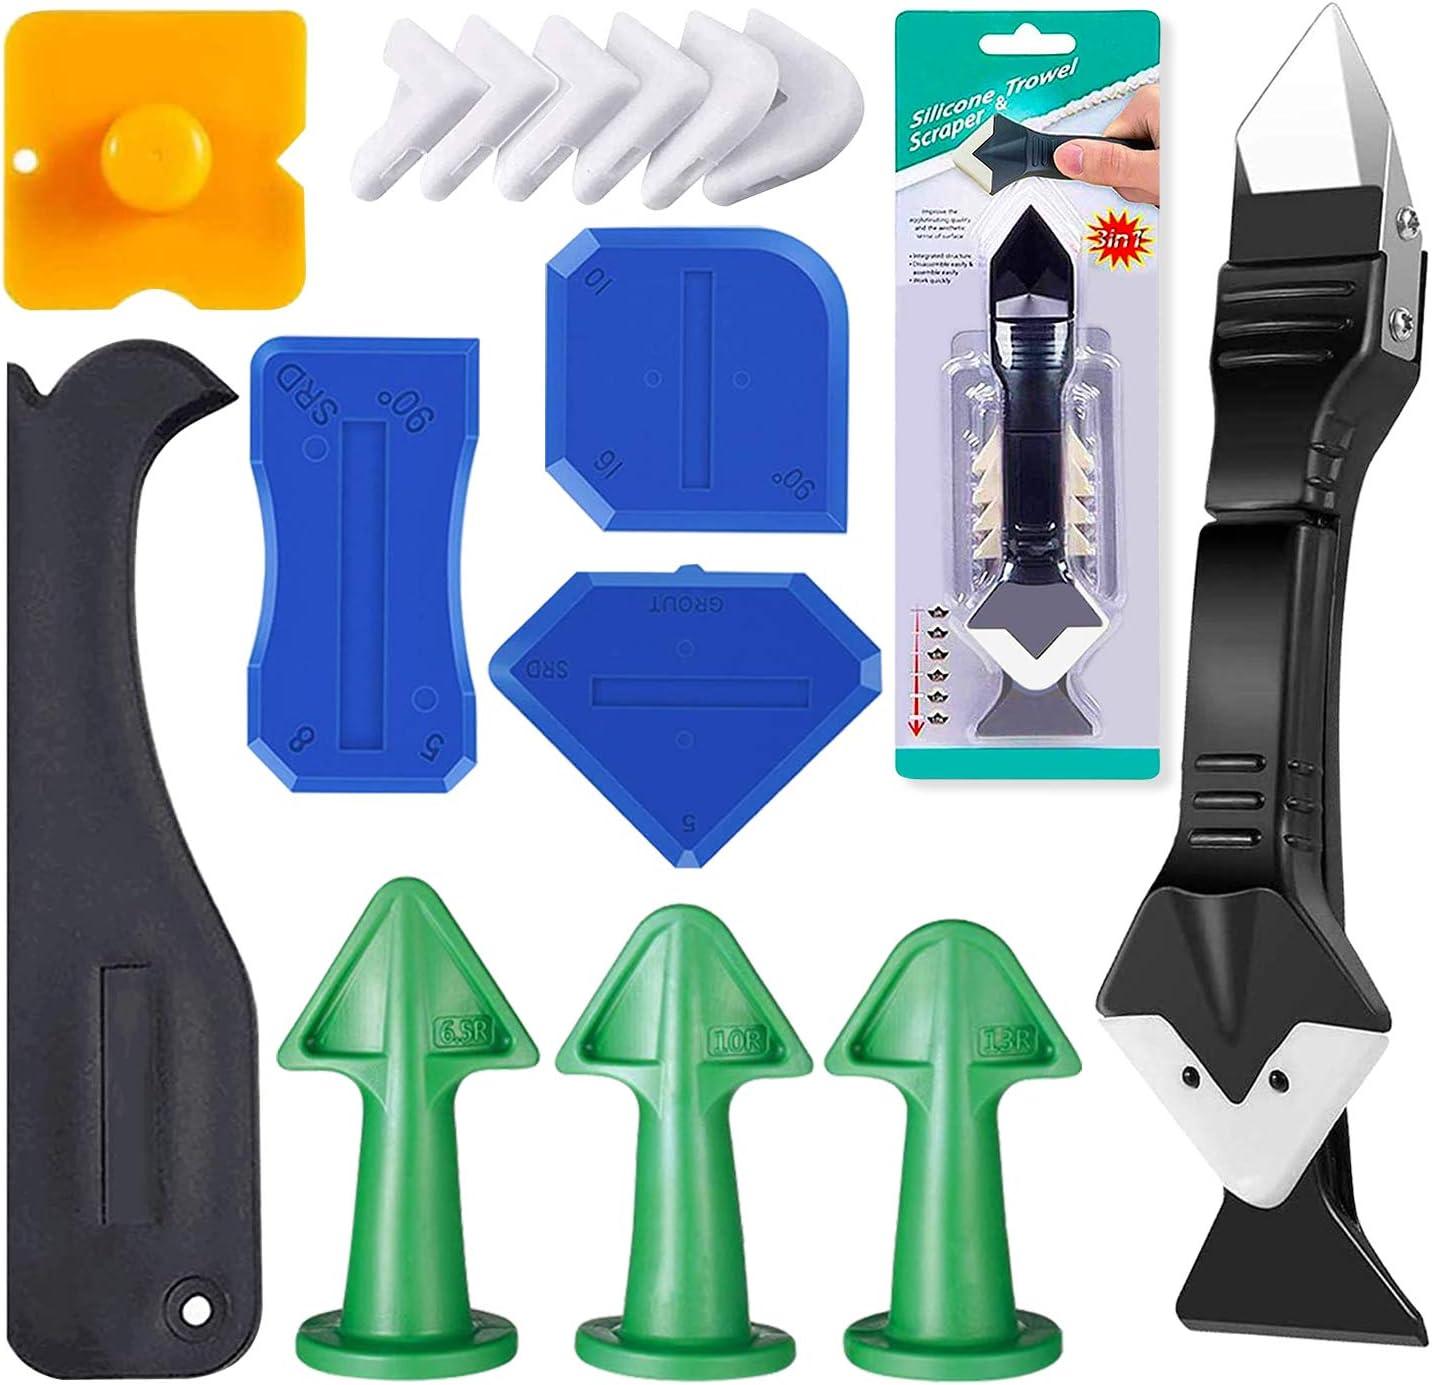 GEARLINTON Caulking Tool online Free shipping / New shopping Kit 3 Steelhead in 1 Caulkin Stainless